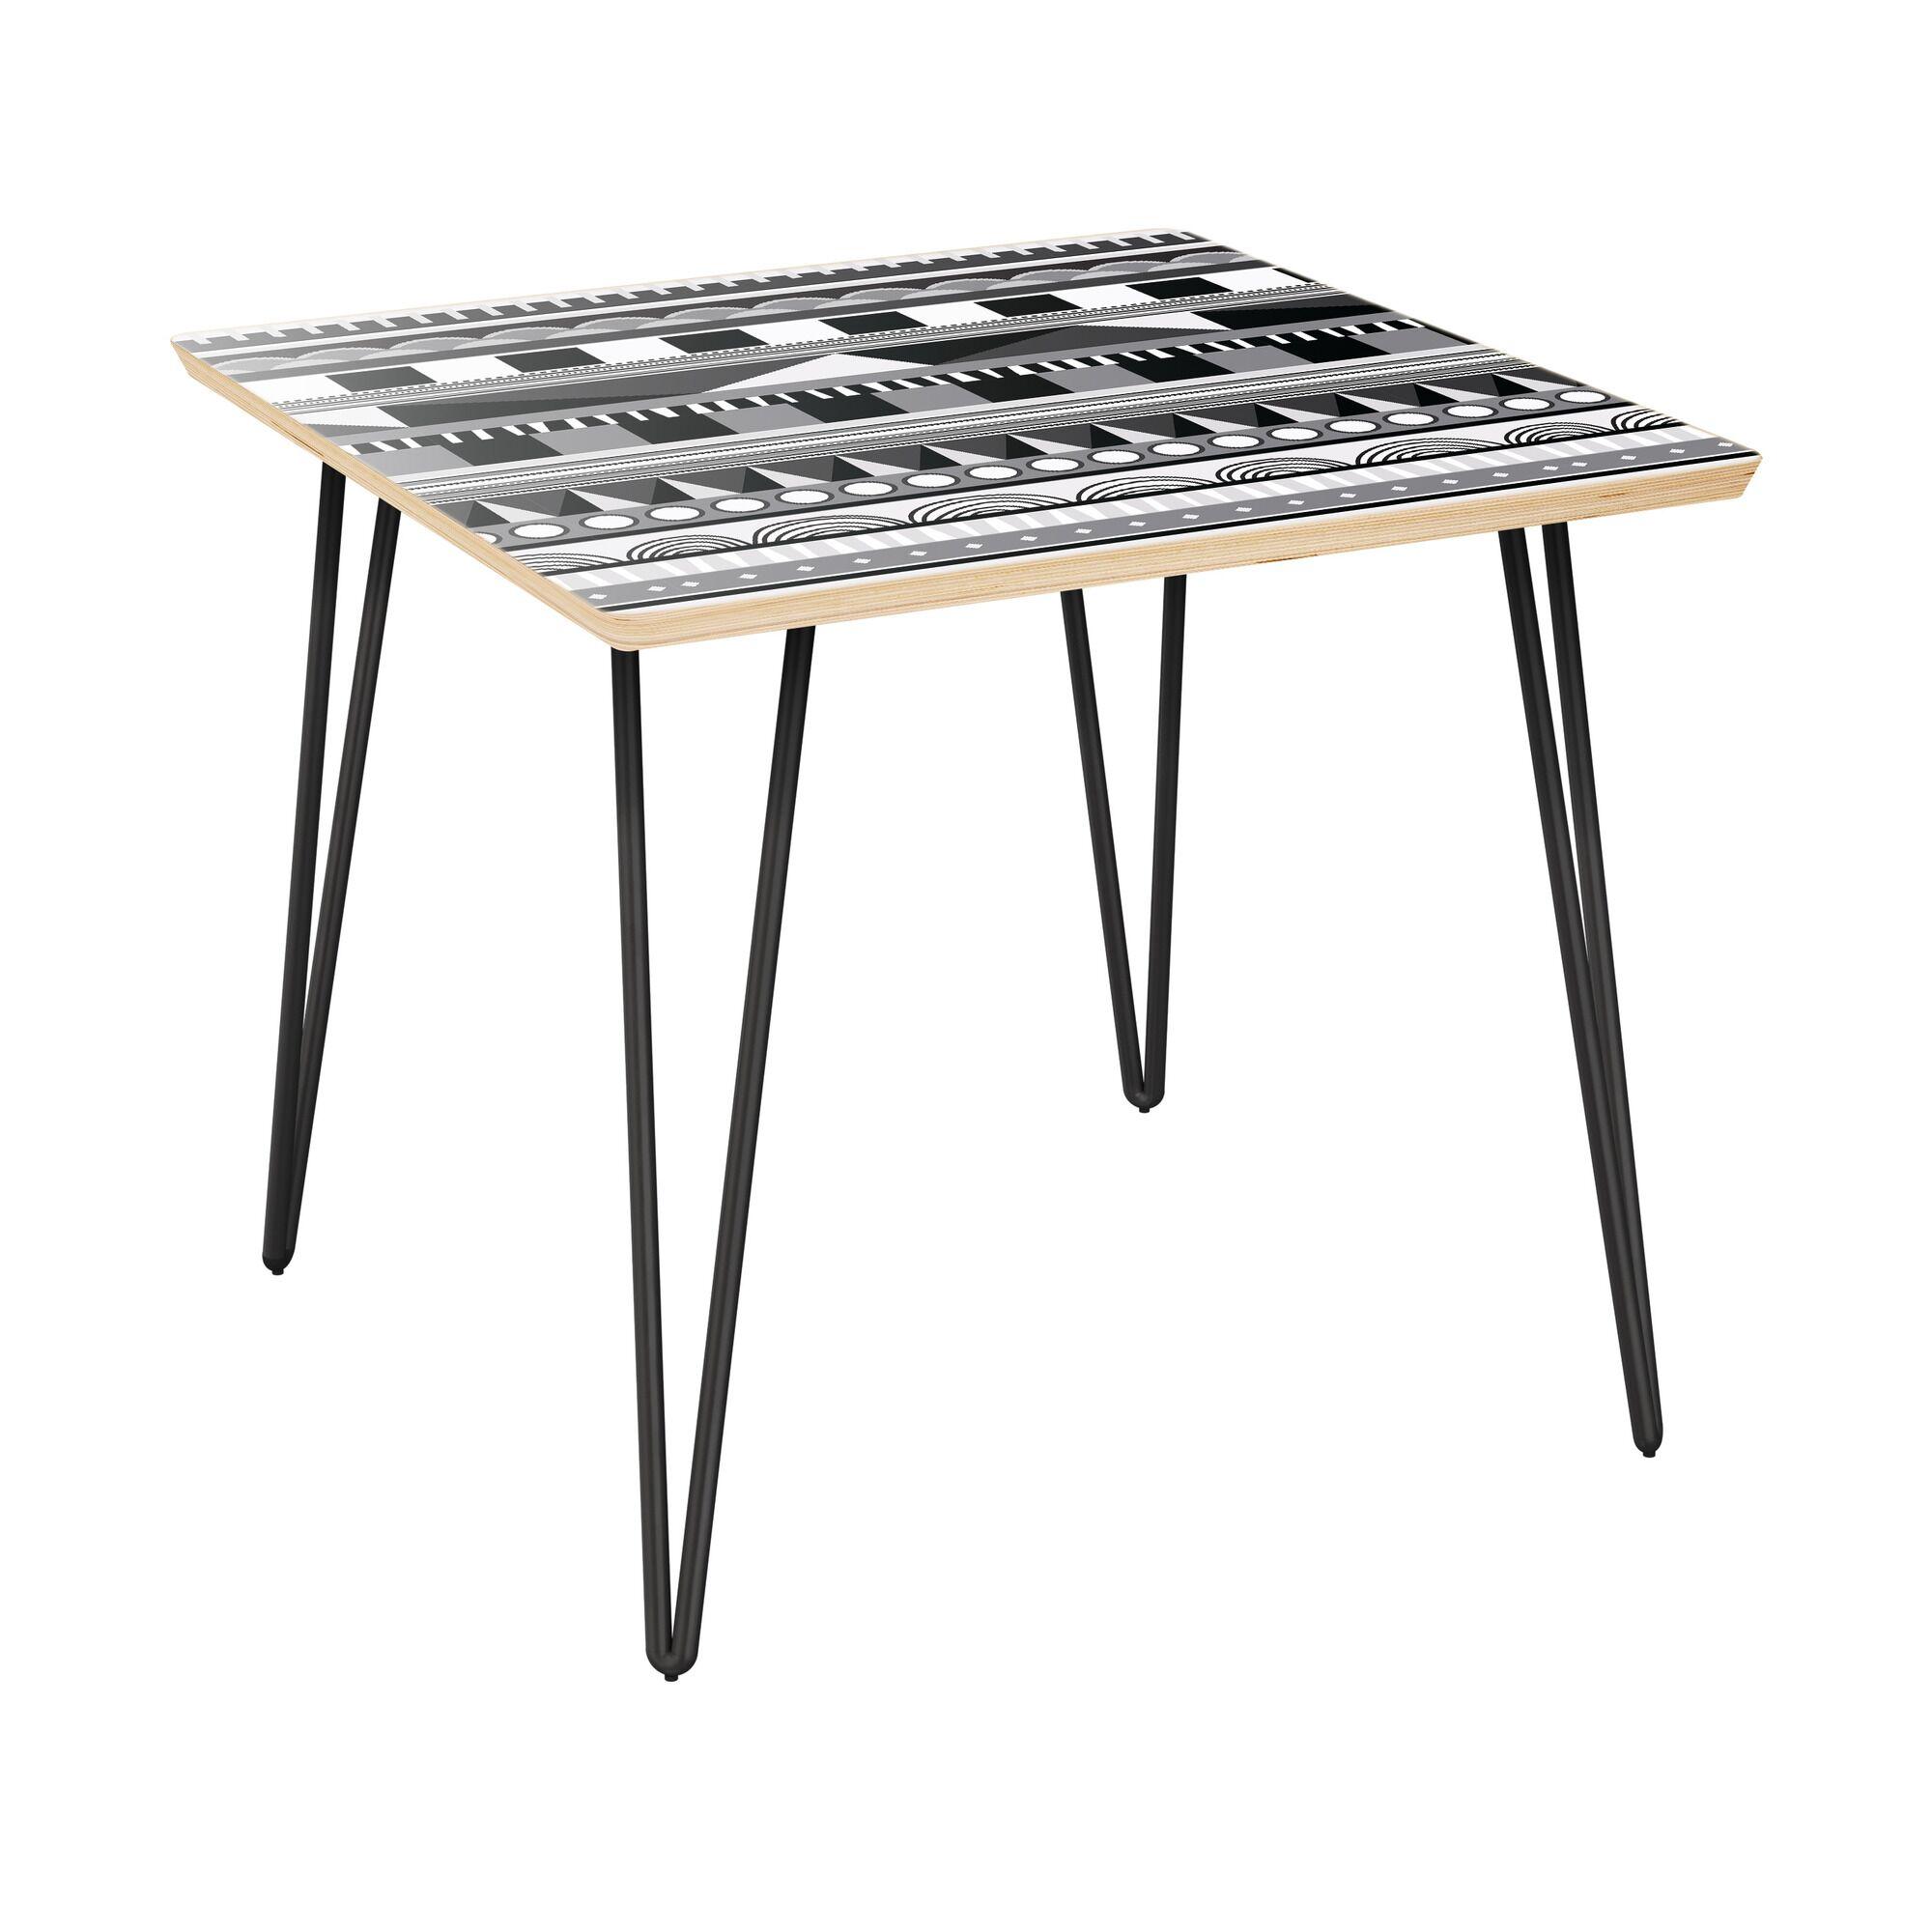 Hunsberger End Table Table Top Color: Natural, Table Base Color: Black